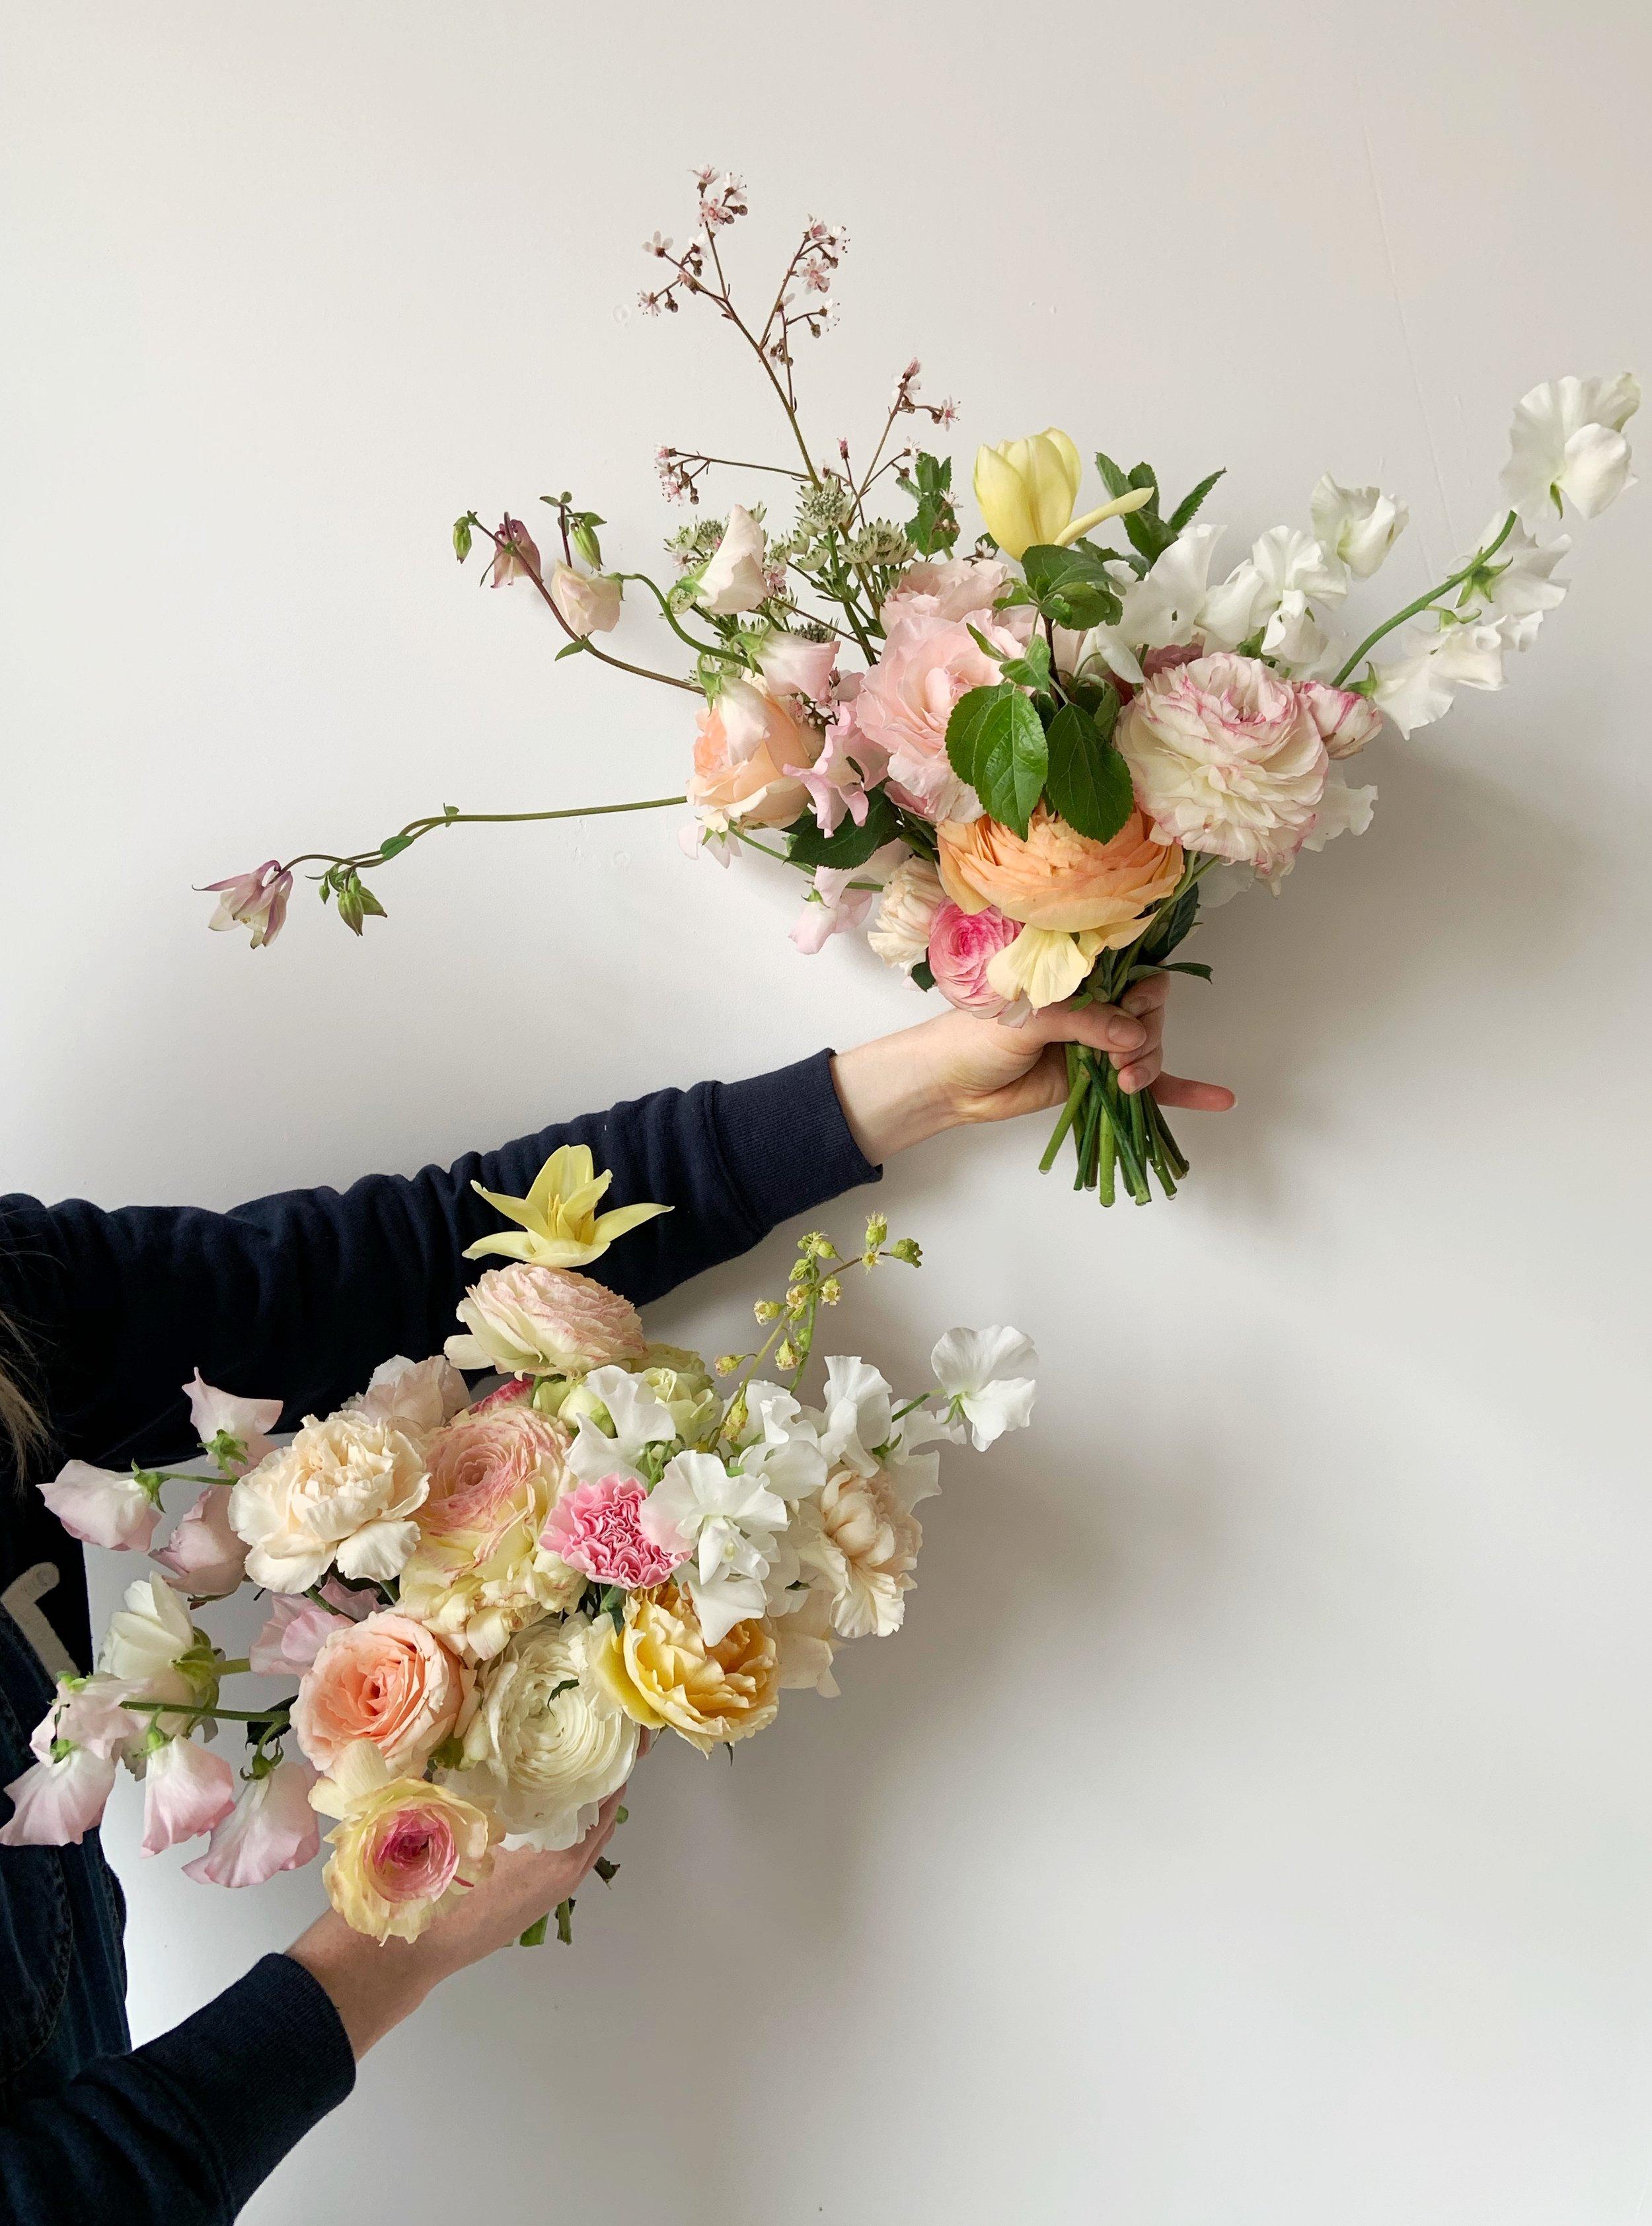 Blume Photography